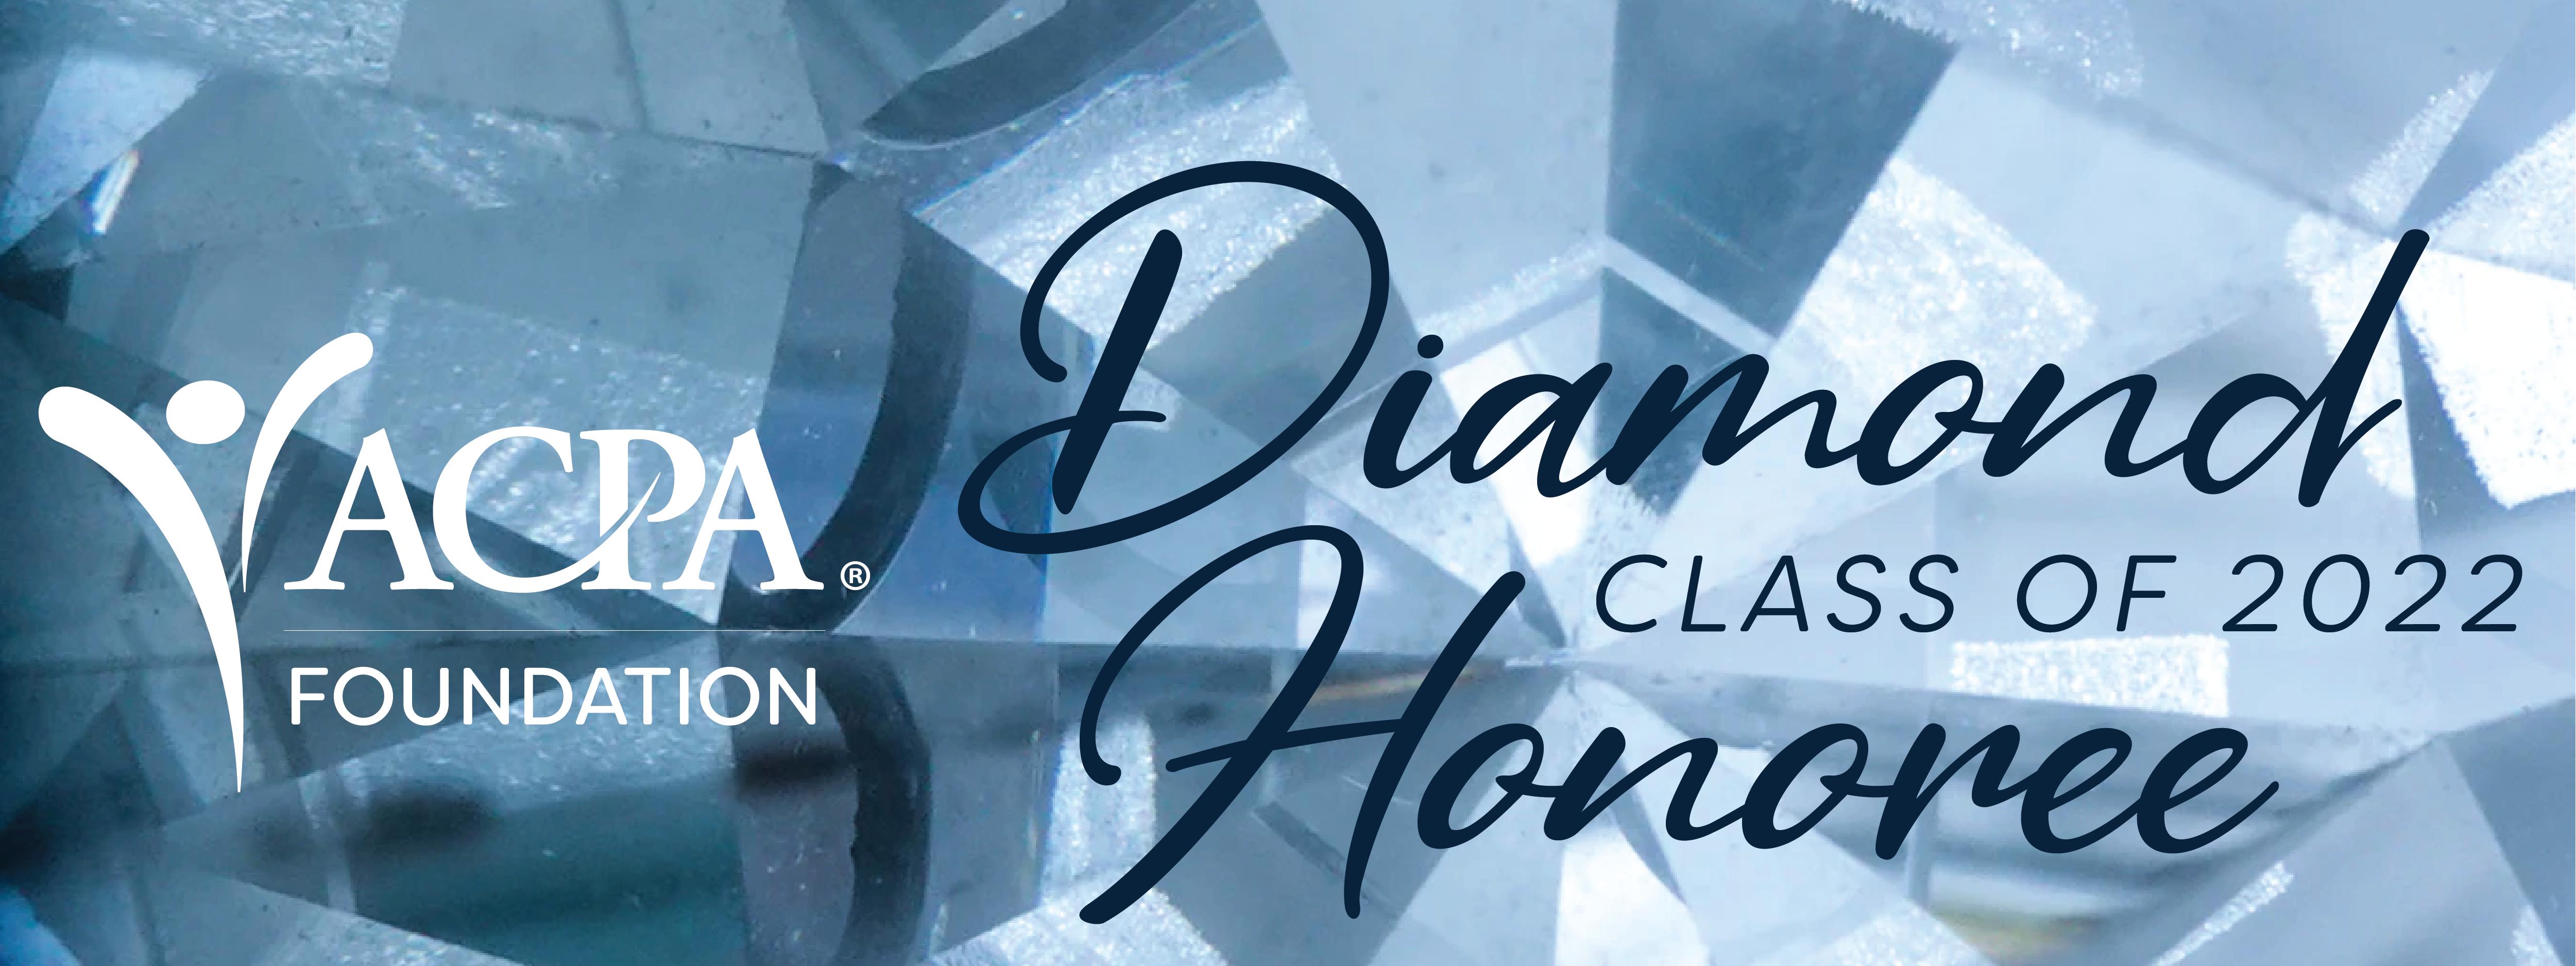 ACPA Foundation Diamond Honoree Class of 2022